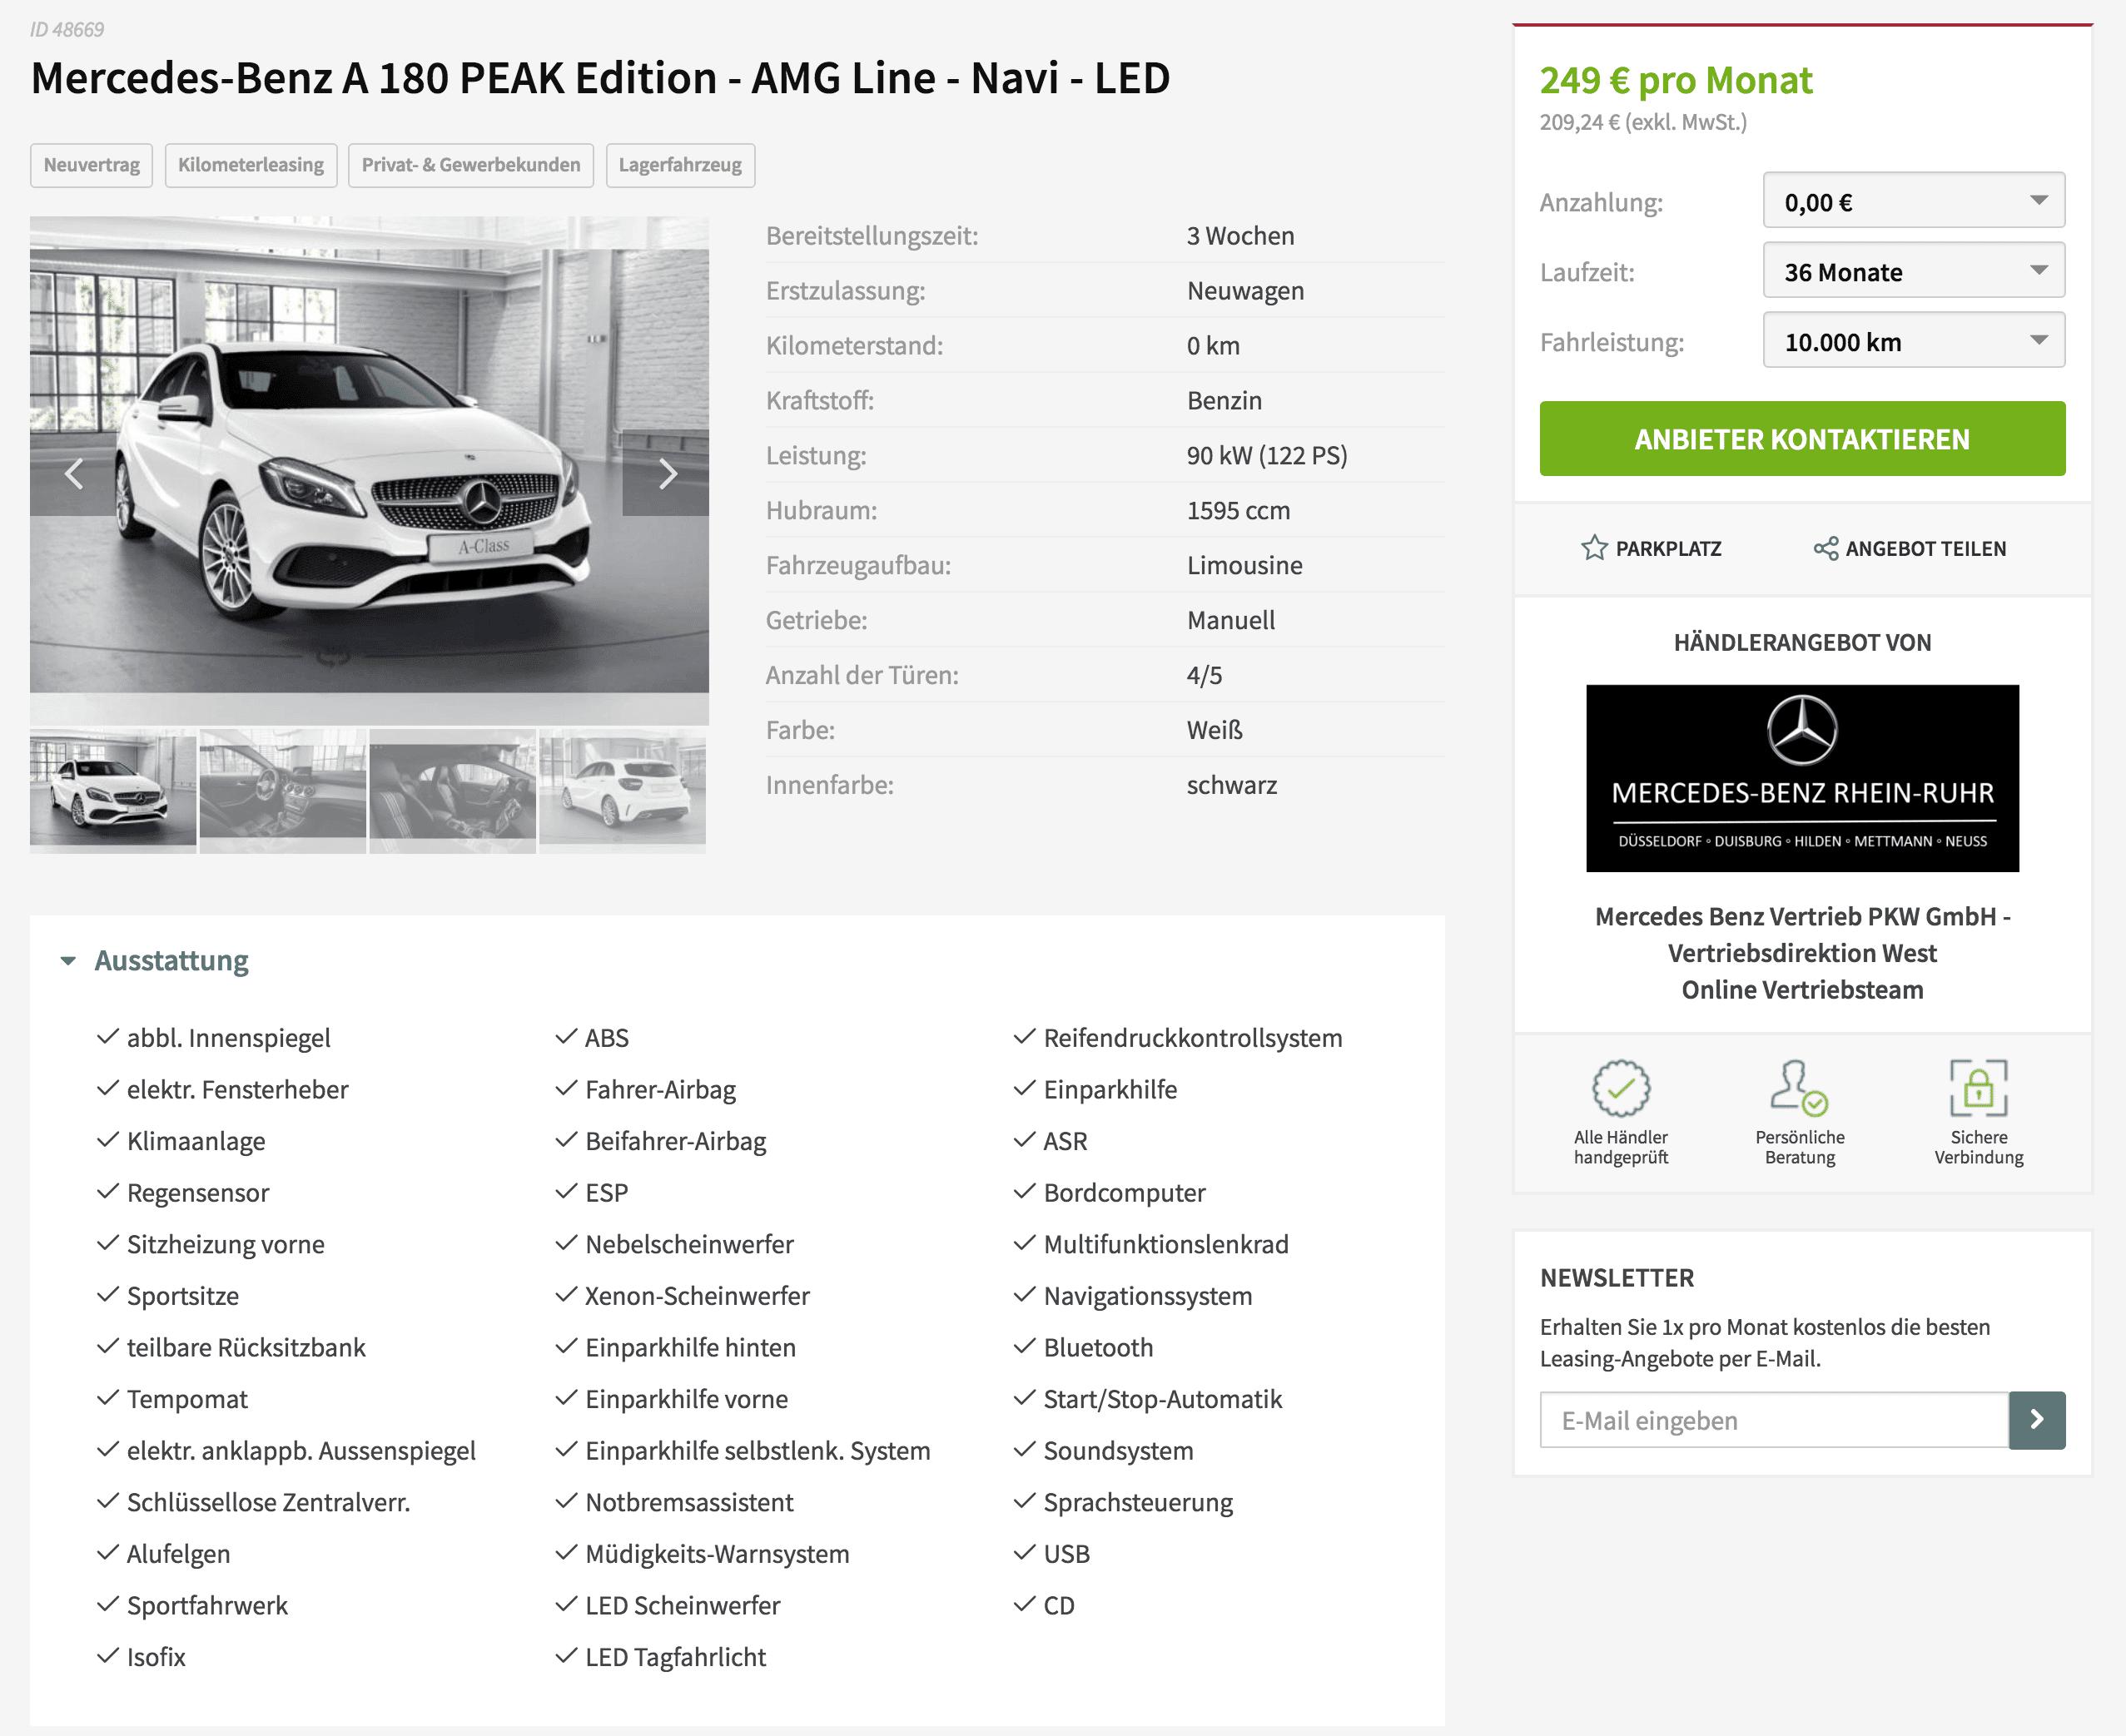 Mercedes benz a180 leasing f r 249 euro im monat brutto for Mercedes benz complaint department